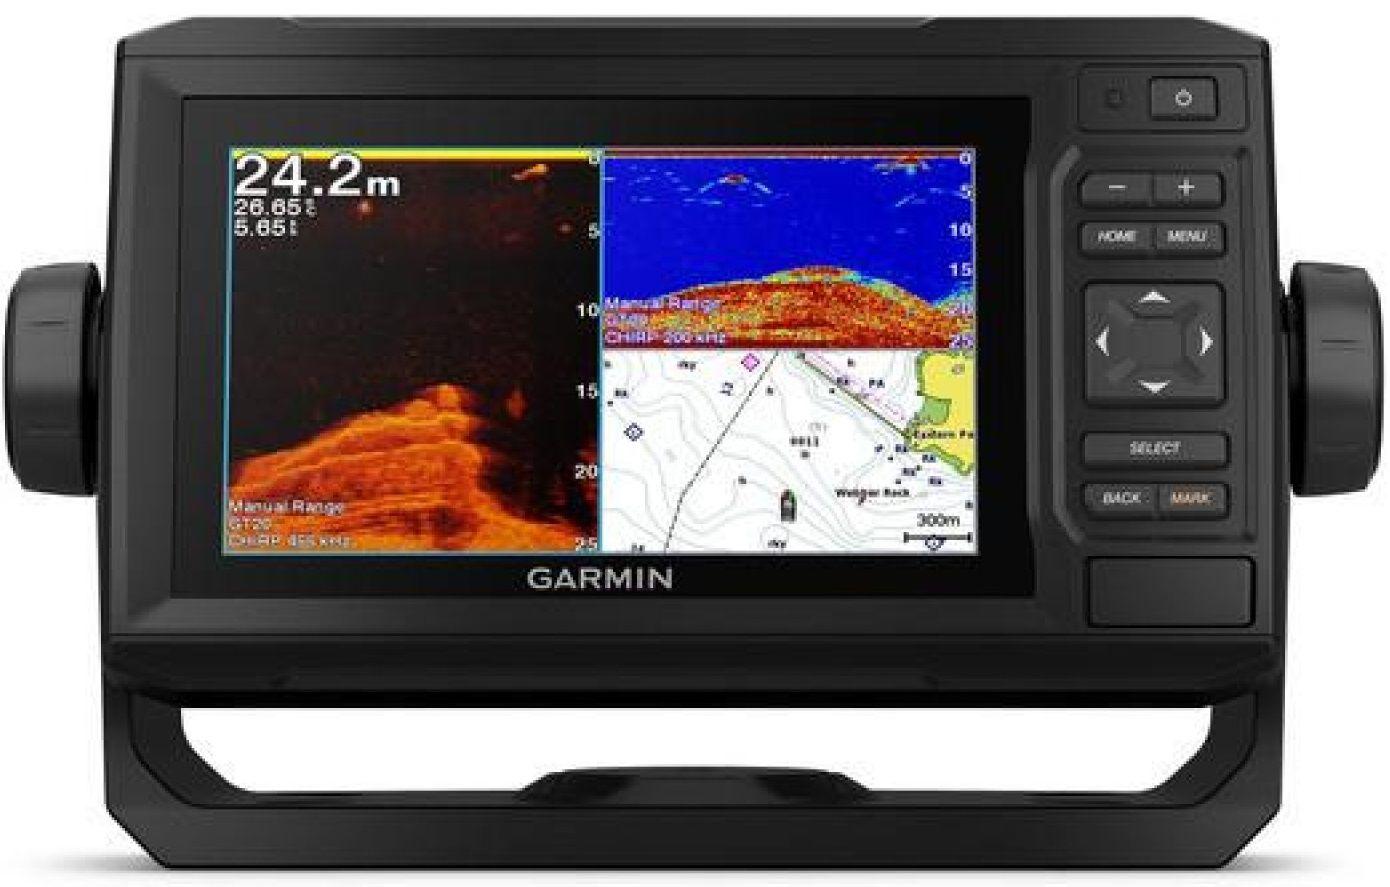 Gps Garmin Echomap 62cv Plus com Transdutor + Carta G2 - 010-01888-01